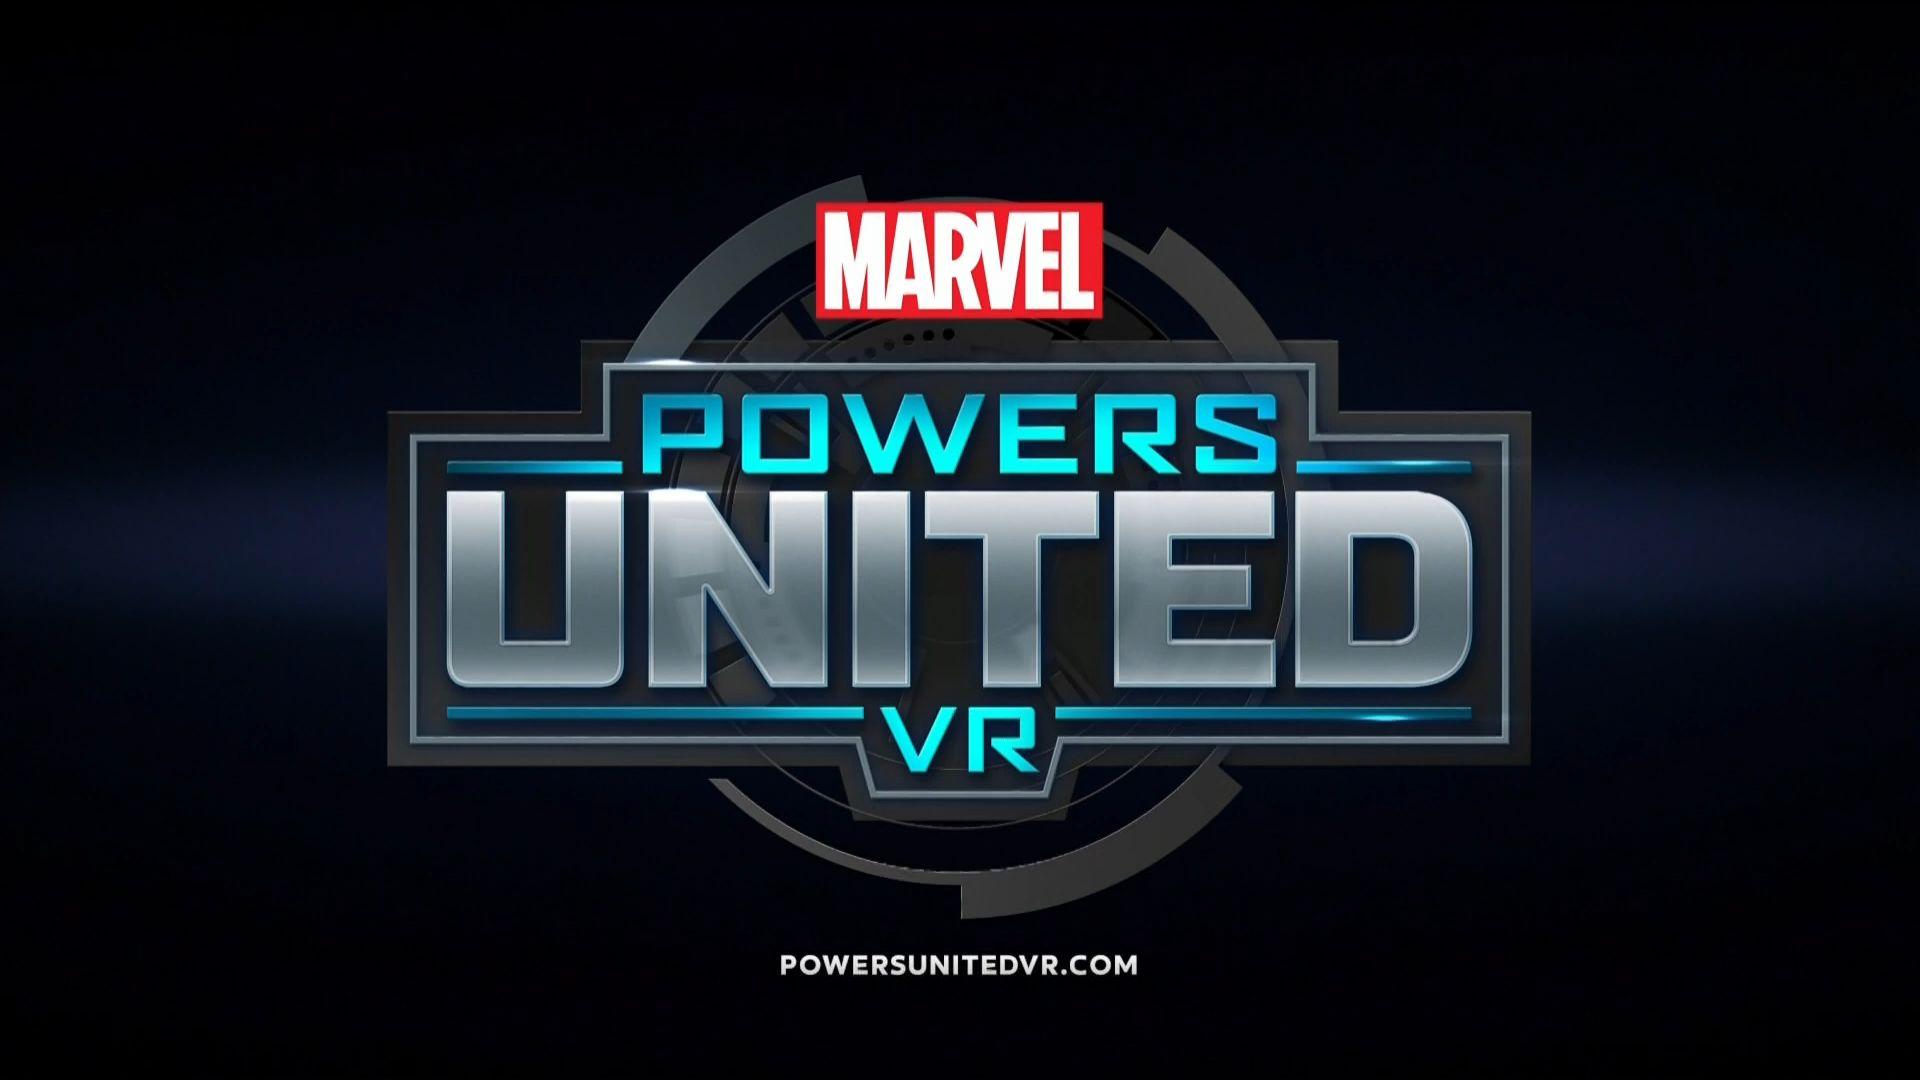 Teljesen törlik a Marvel Powers Unitedet